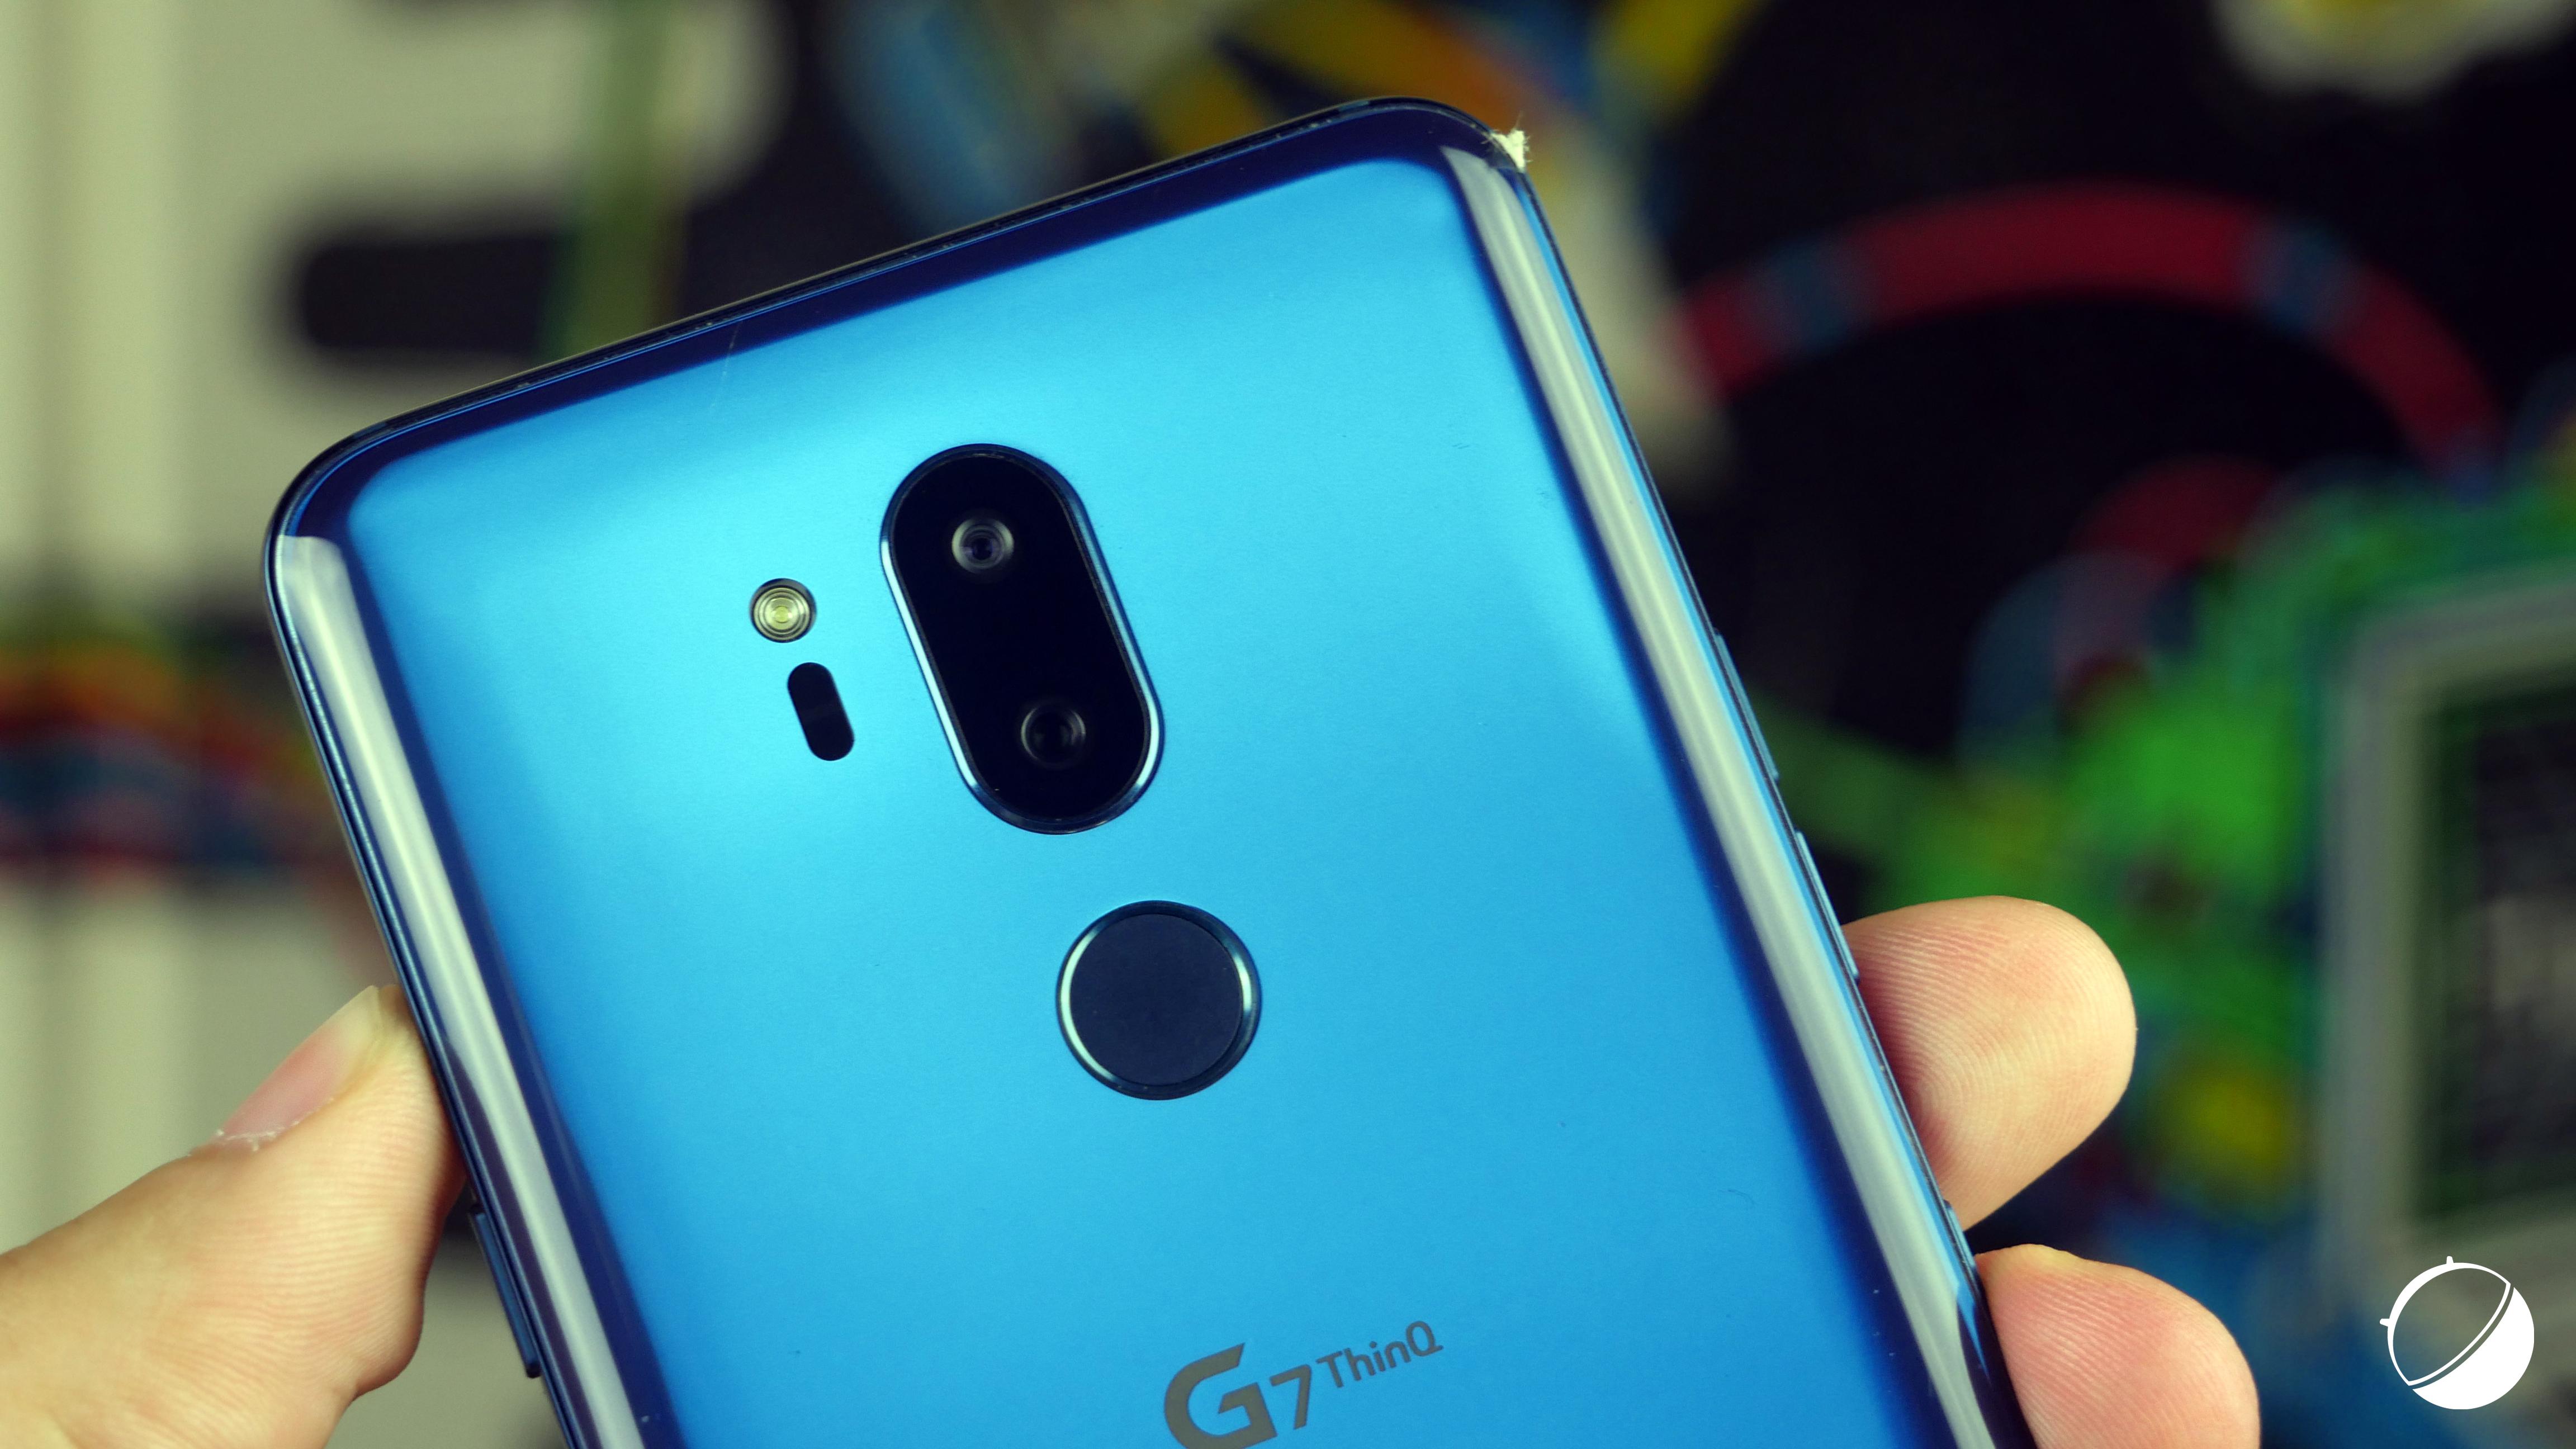 Test LG G7 ThinQ : notre avis complet - Smartphones - FrAndroid